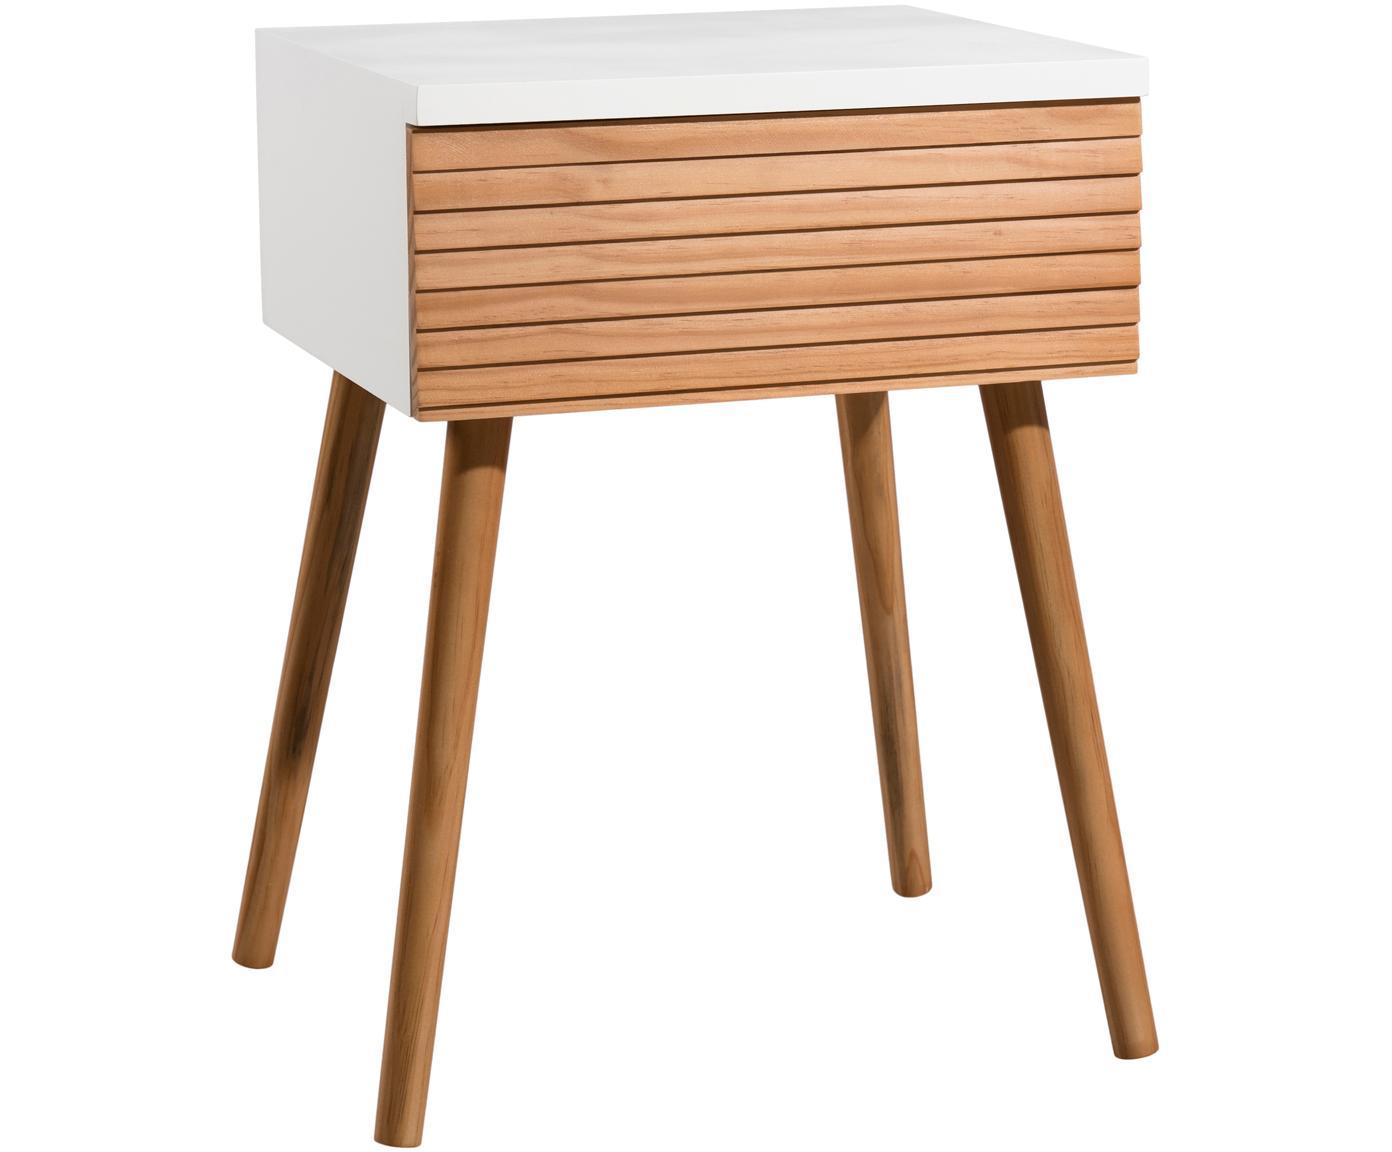 Mesilla de noche Pedro, estilo escandinavo, Estructura: tablero de fibras de dens, Blanco, madera de pino, An 40 x Al 56 cm